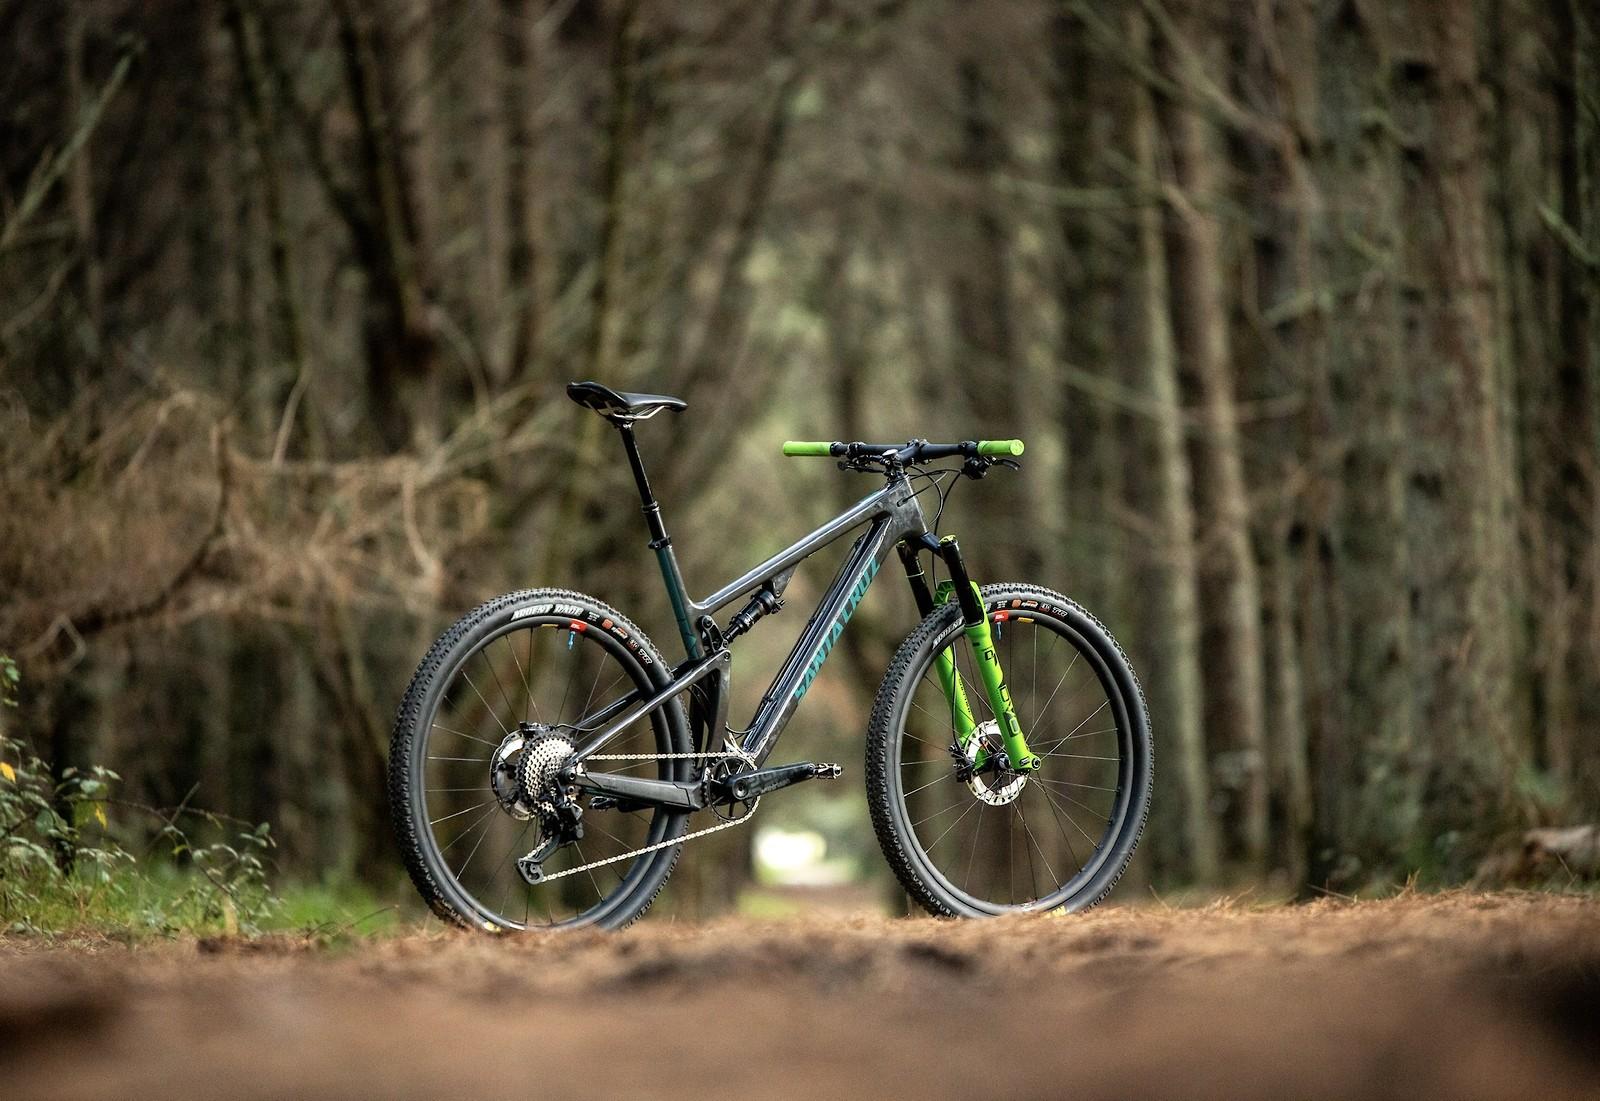 Santa Cruz Blur - almost an XC bike